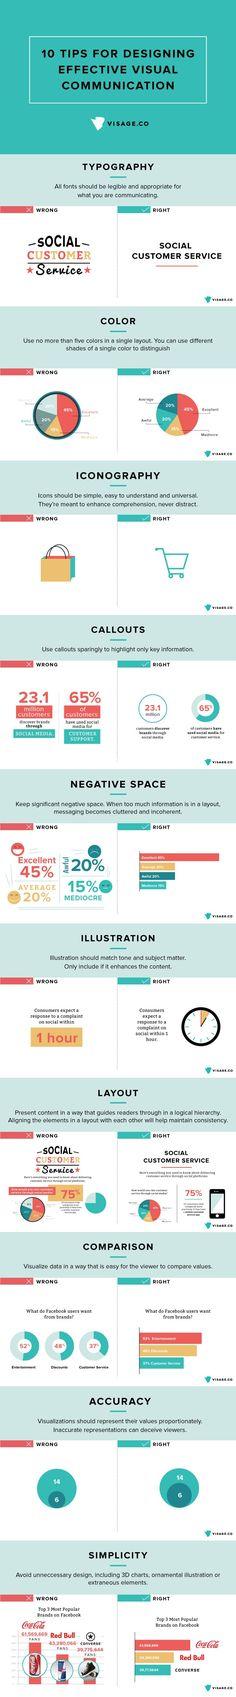 Visual #communication #Marketing #Web #Business #Entrepreneur #Startup #Ecommerce #Content